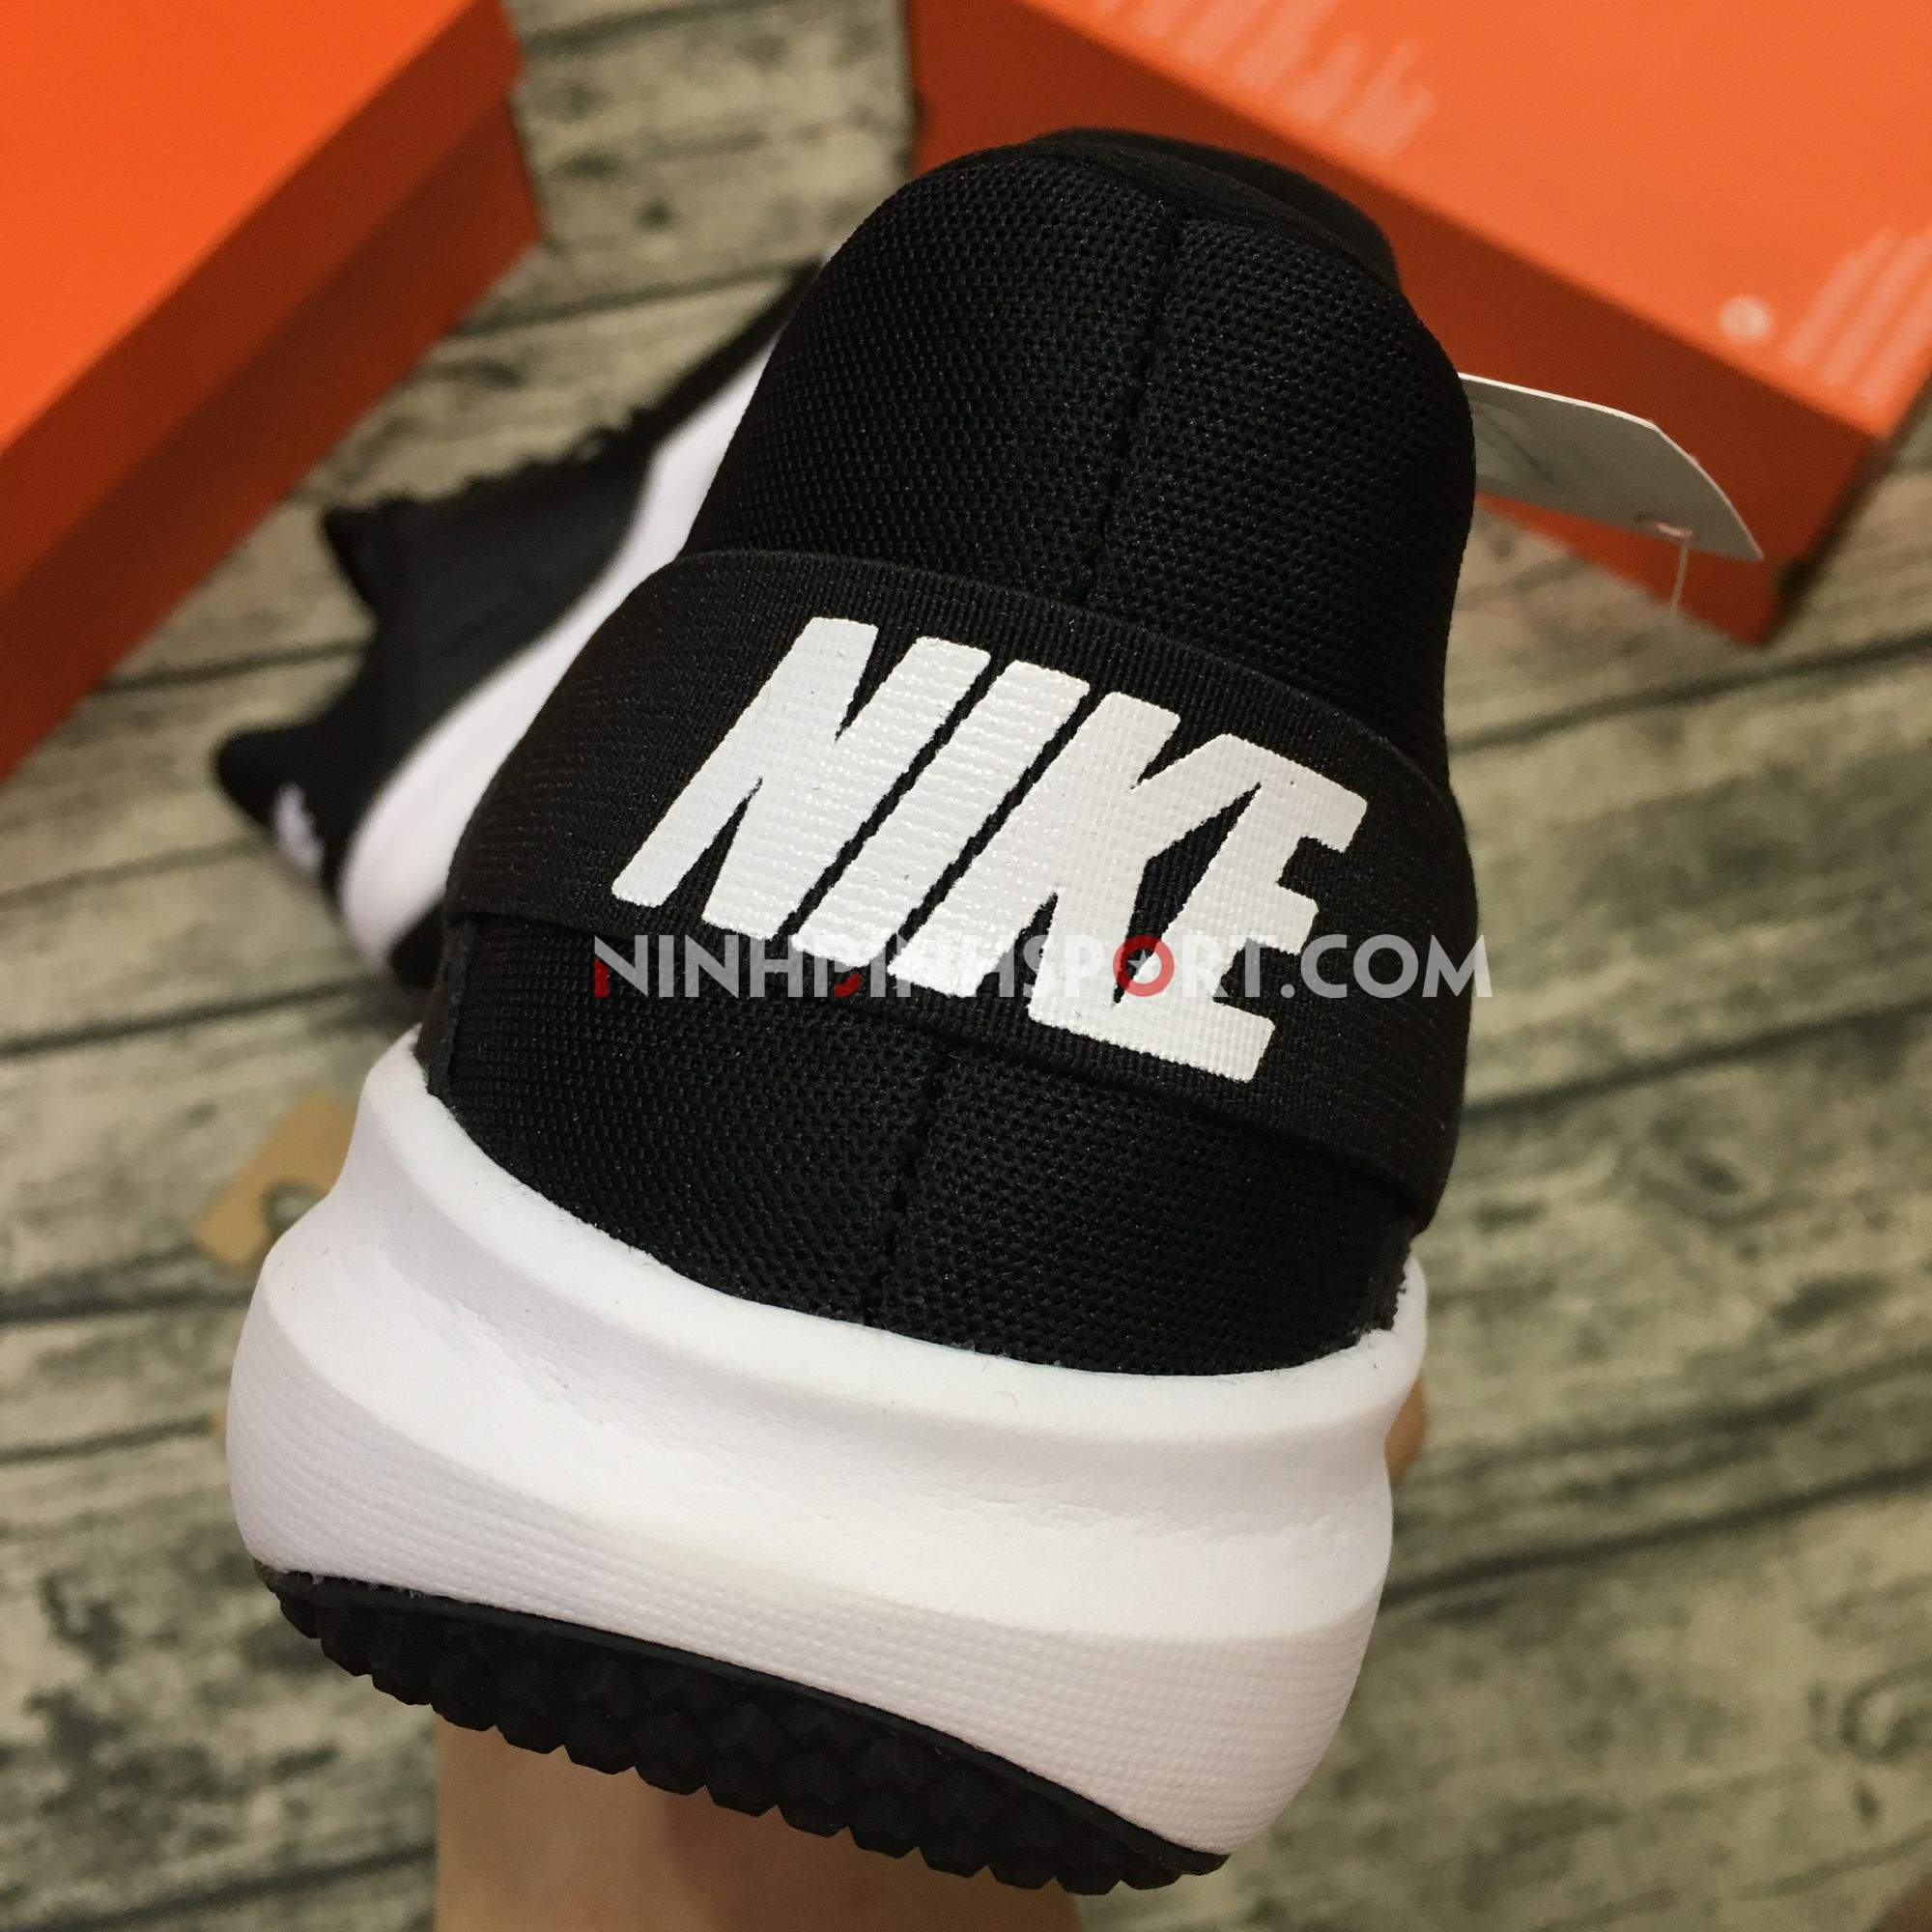 Giày thể thao nam Nike Flex Control 3 AJ5911-001